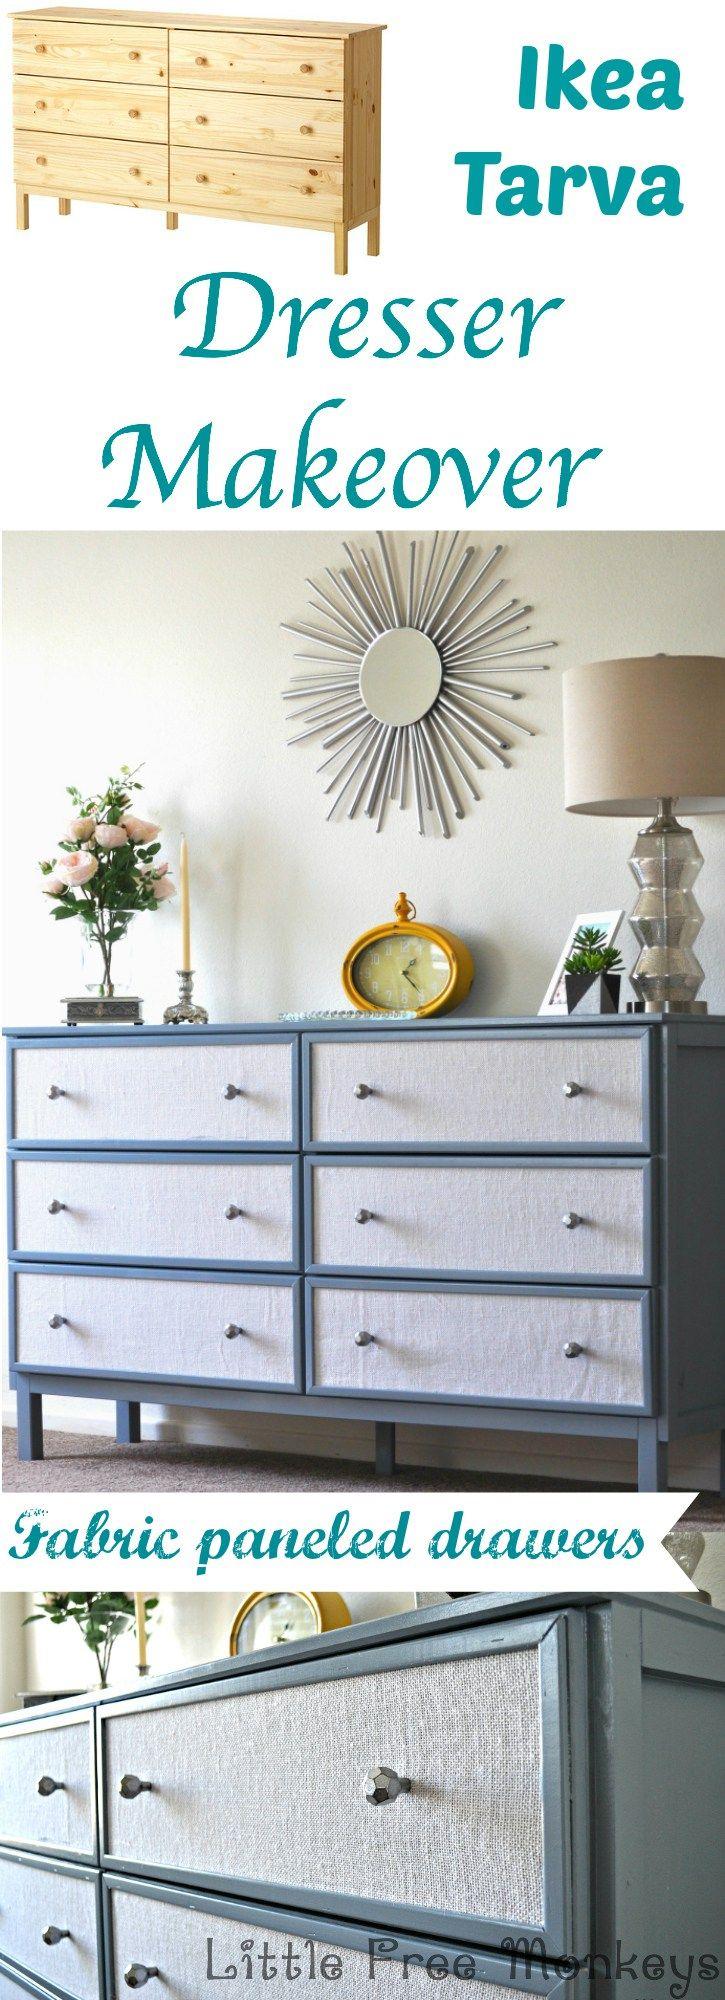 IKEA Tarva Dresser In Home Decor: 35 Cool Ideas